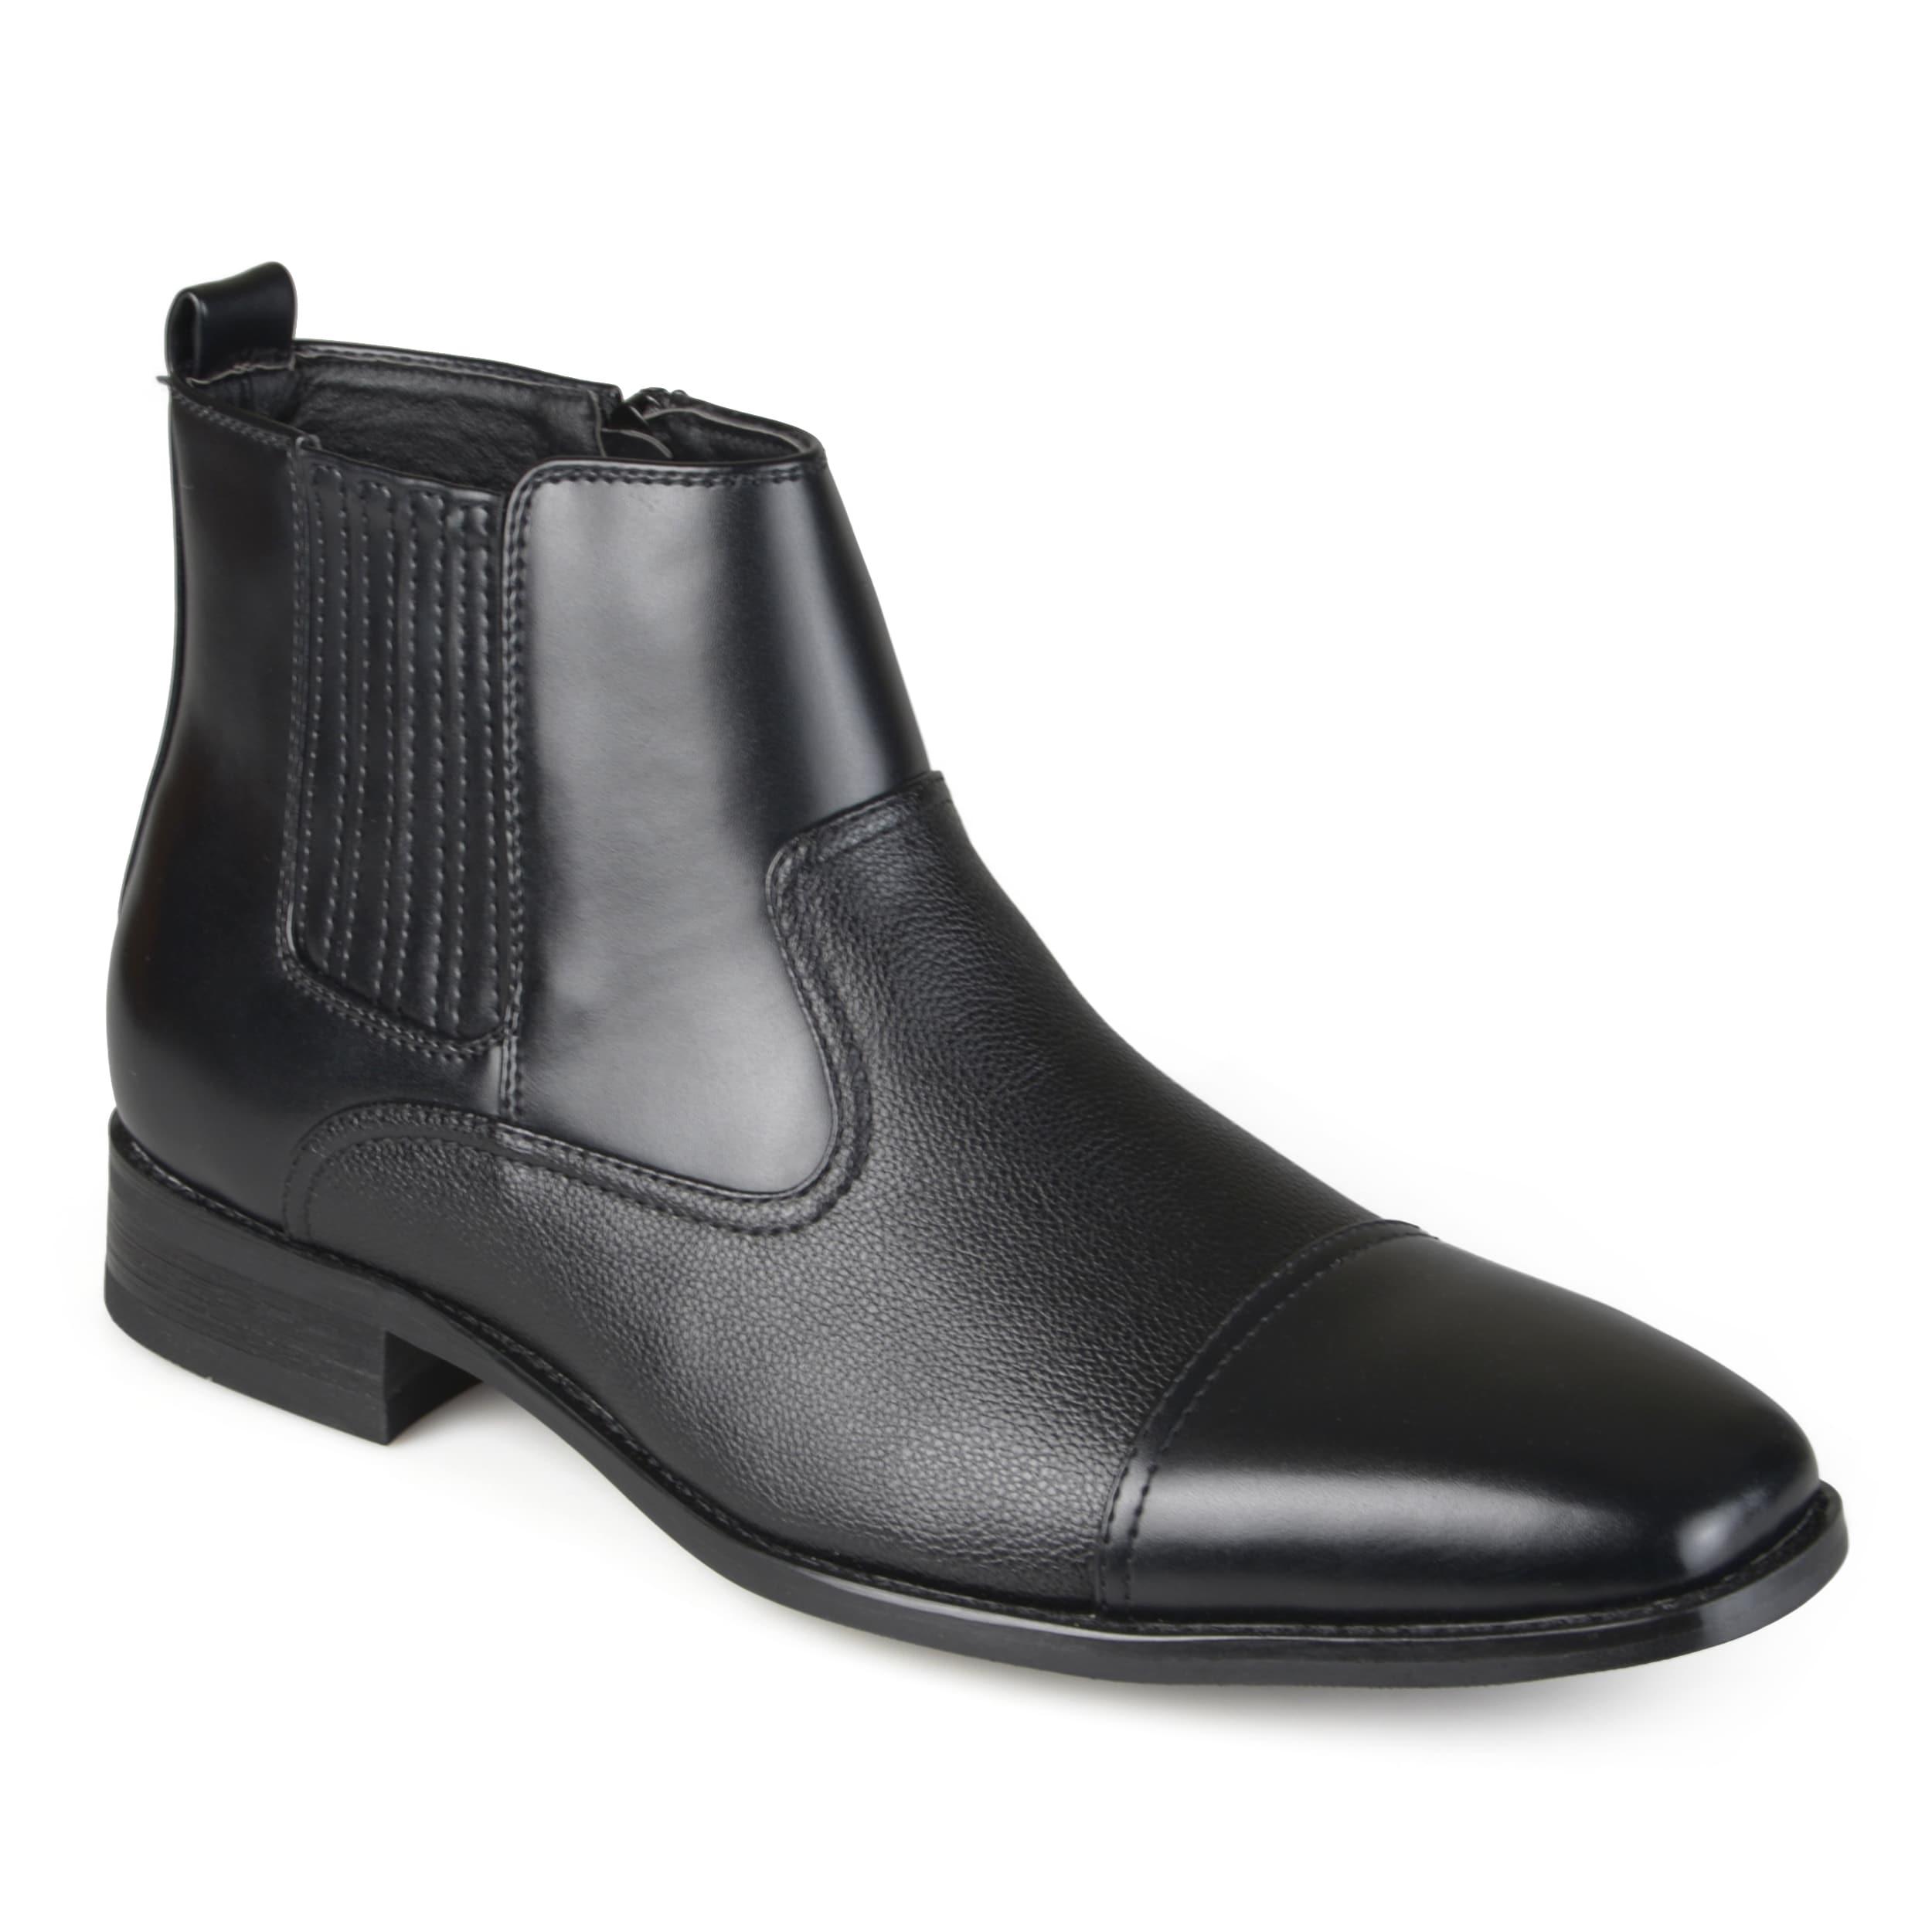 Faux Leather Cap Toe Dress Boots